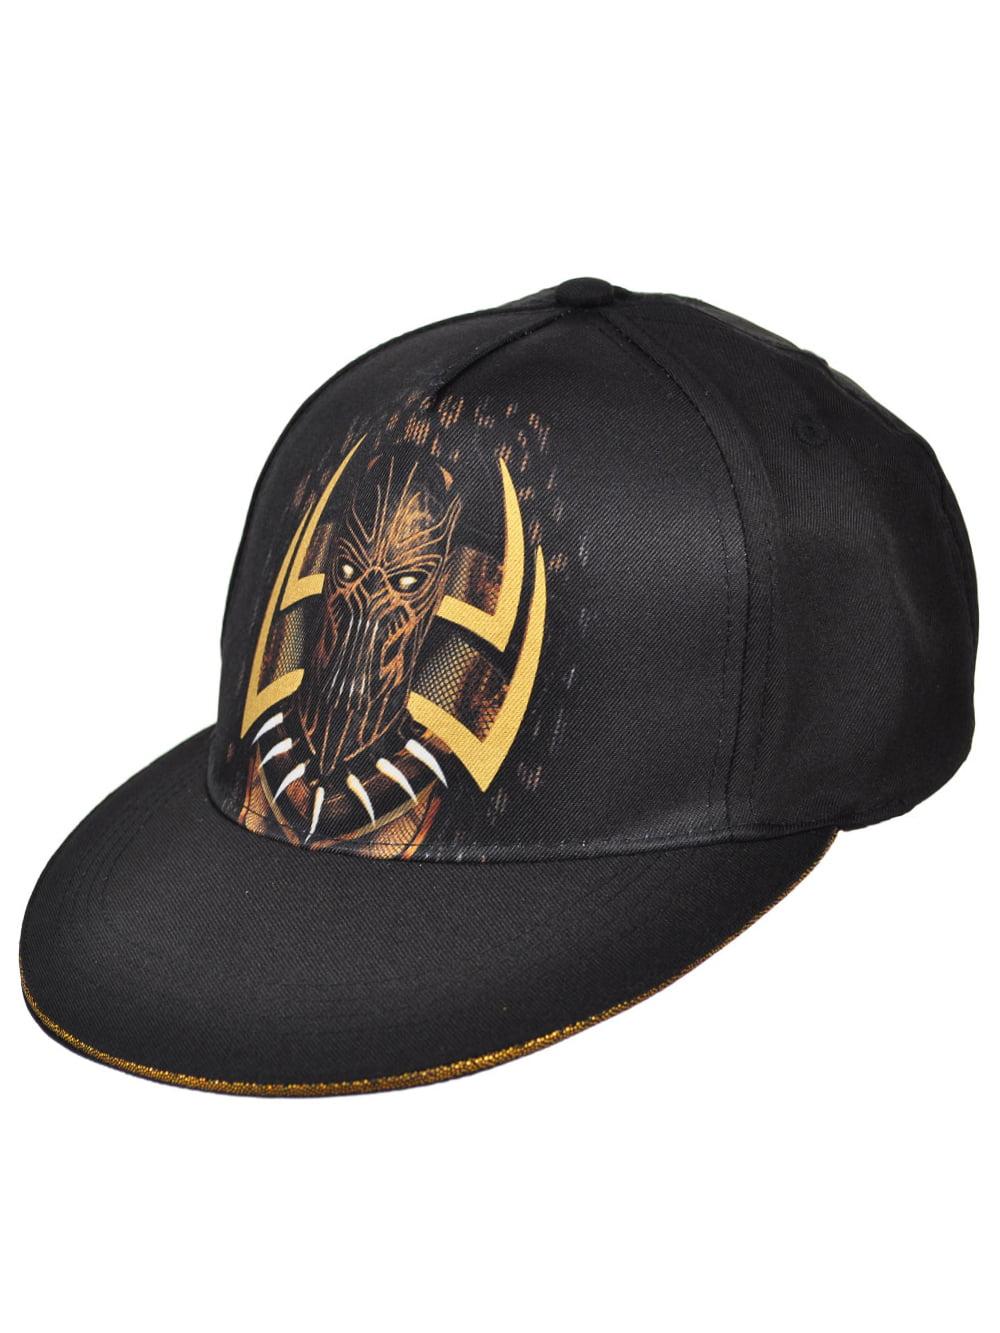 buy popular 6256f 016c8 Marvel Black Panther Snapback Cap (Youth One Size) - Walmart.com